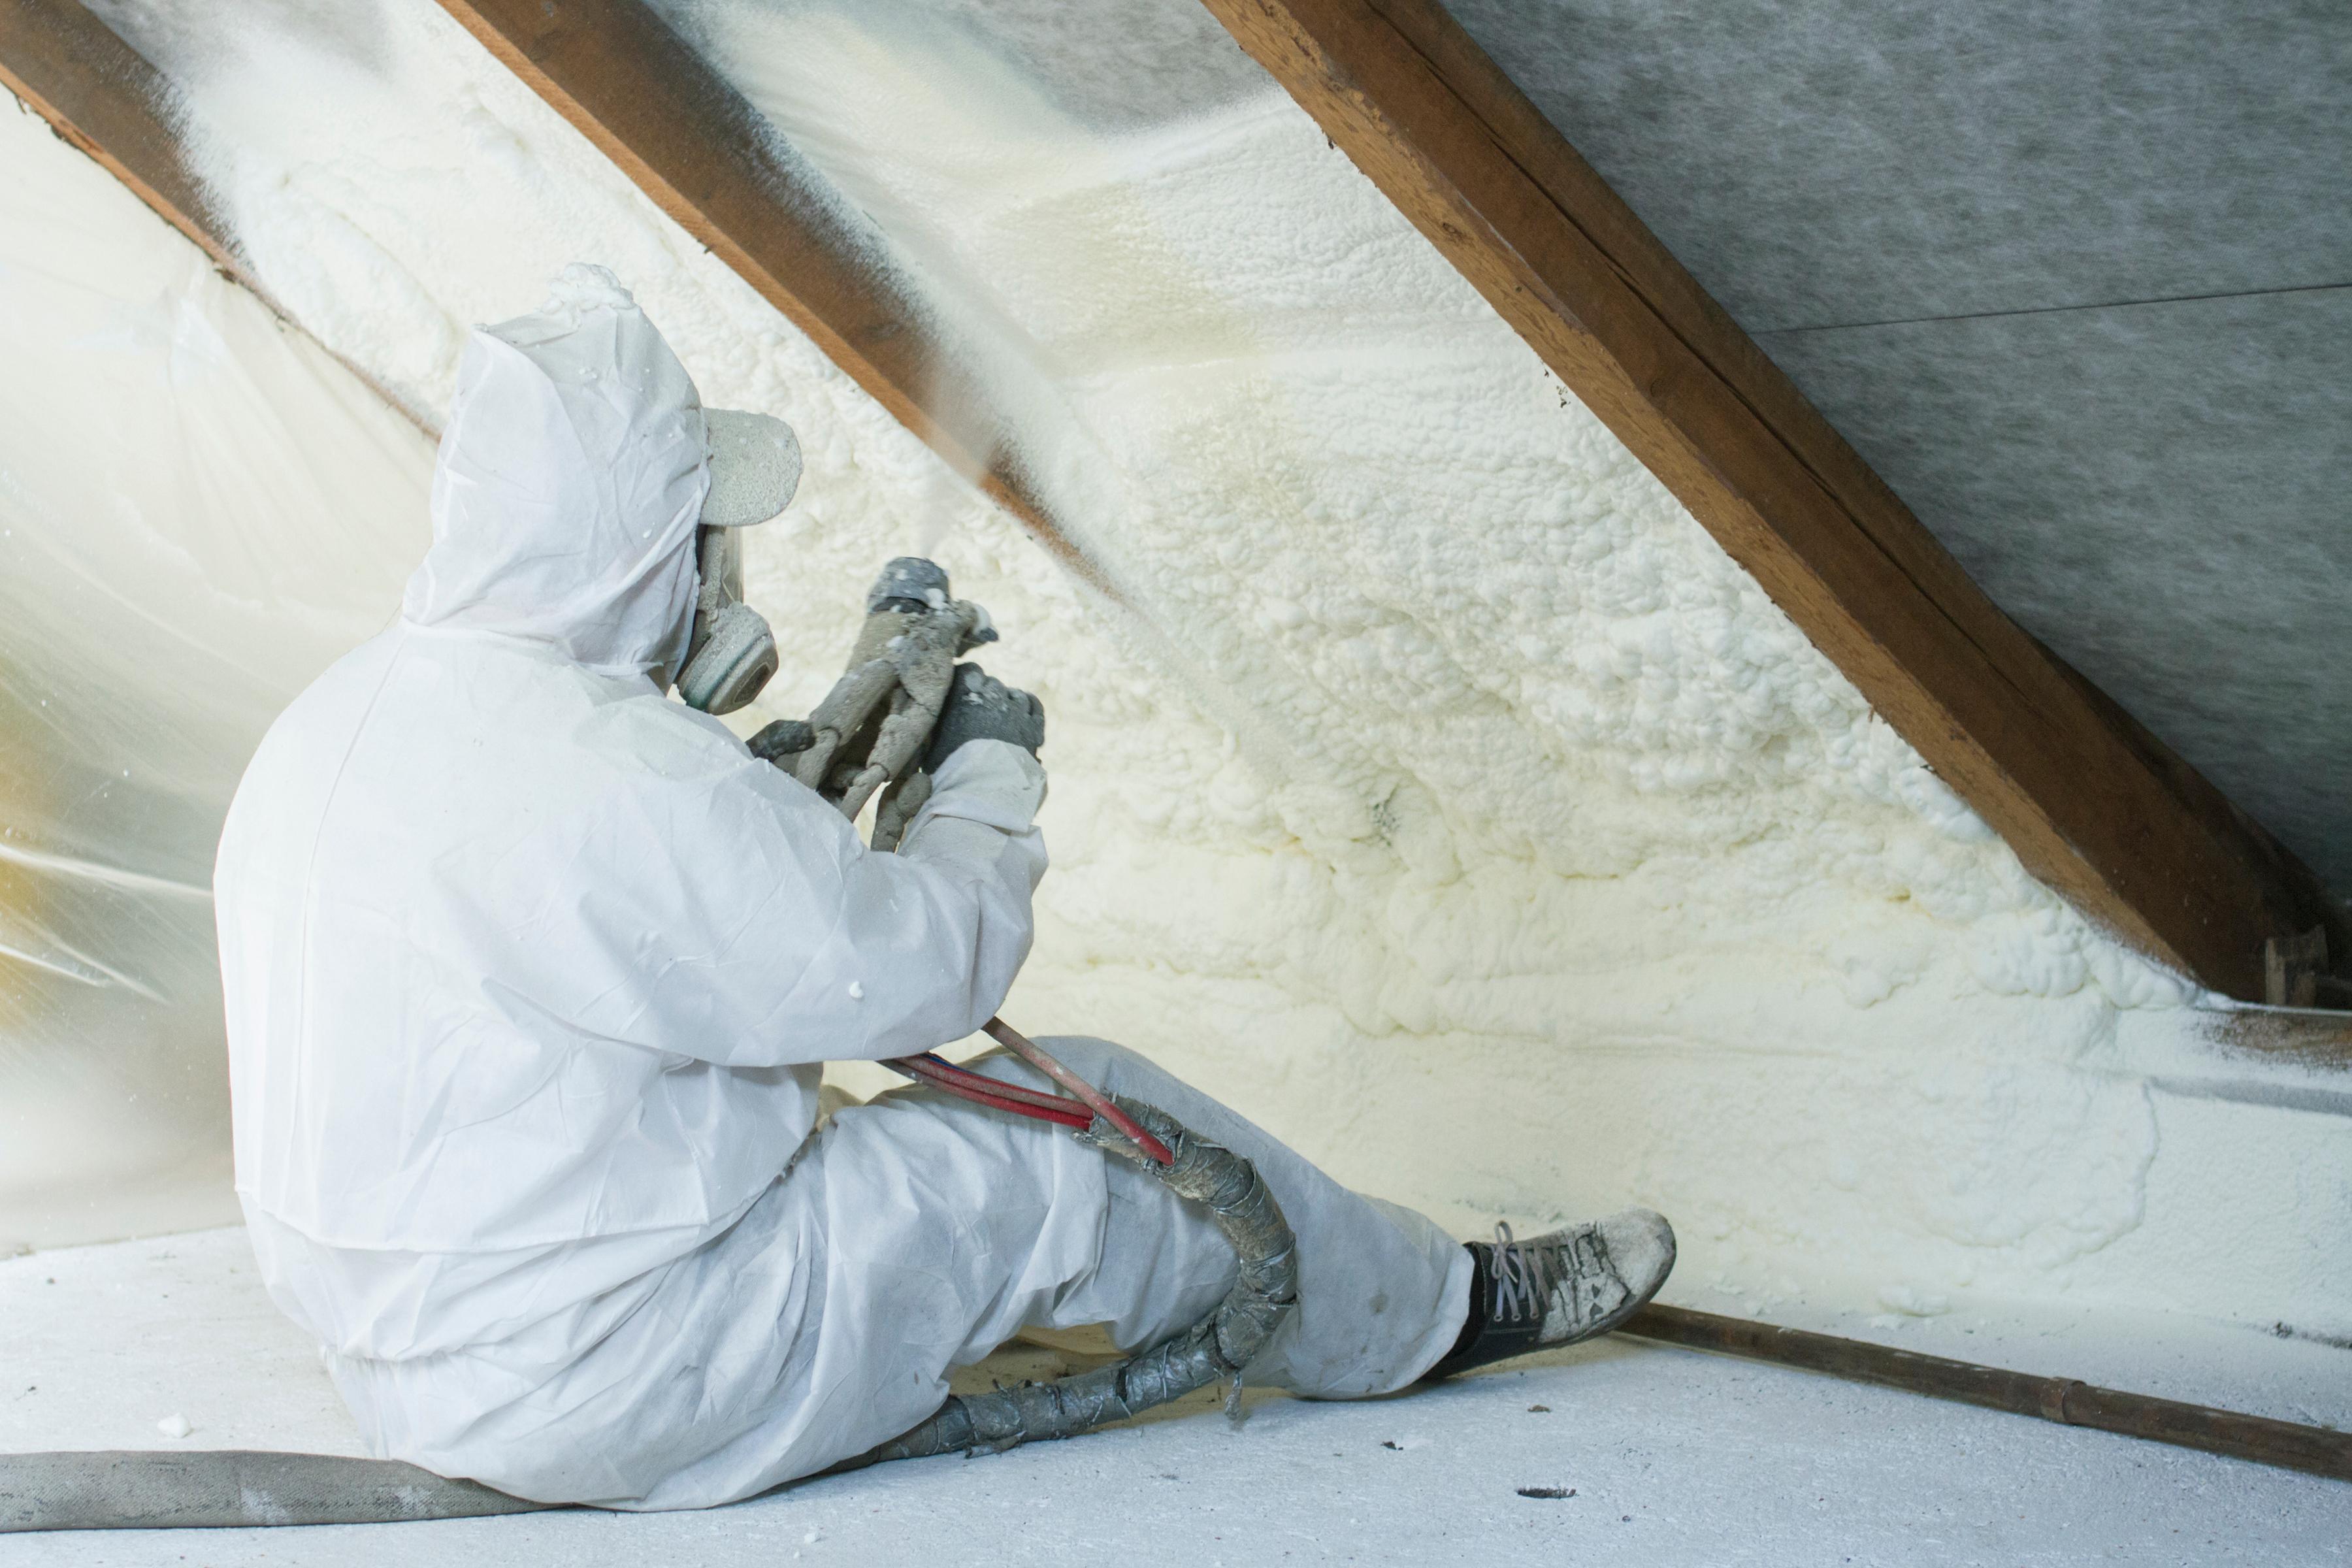 2-Polyurethane-foam-insulation-construction